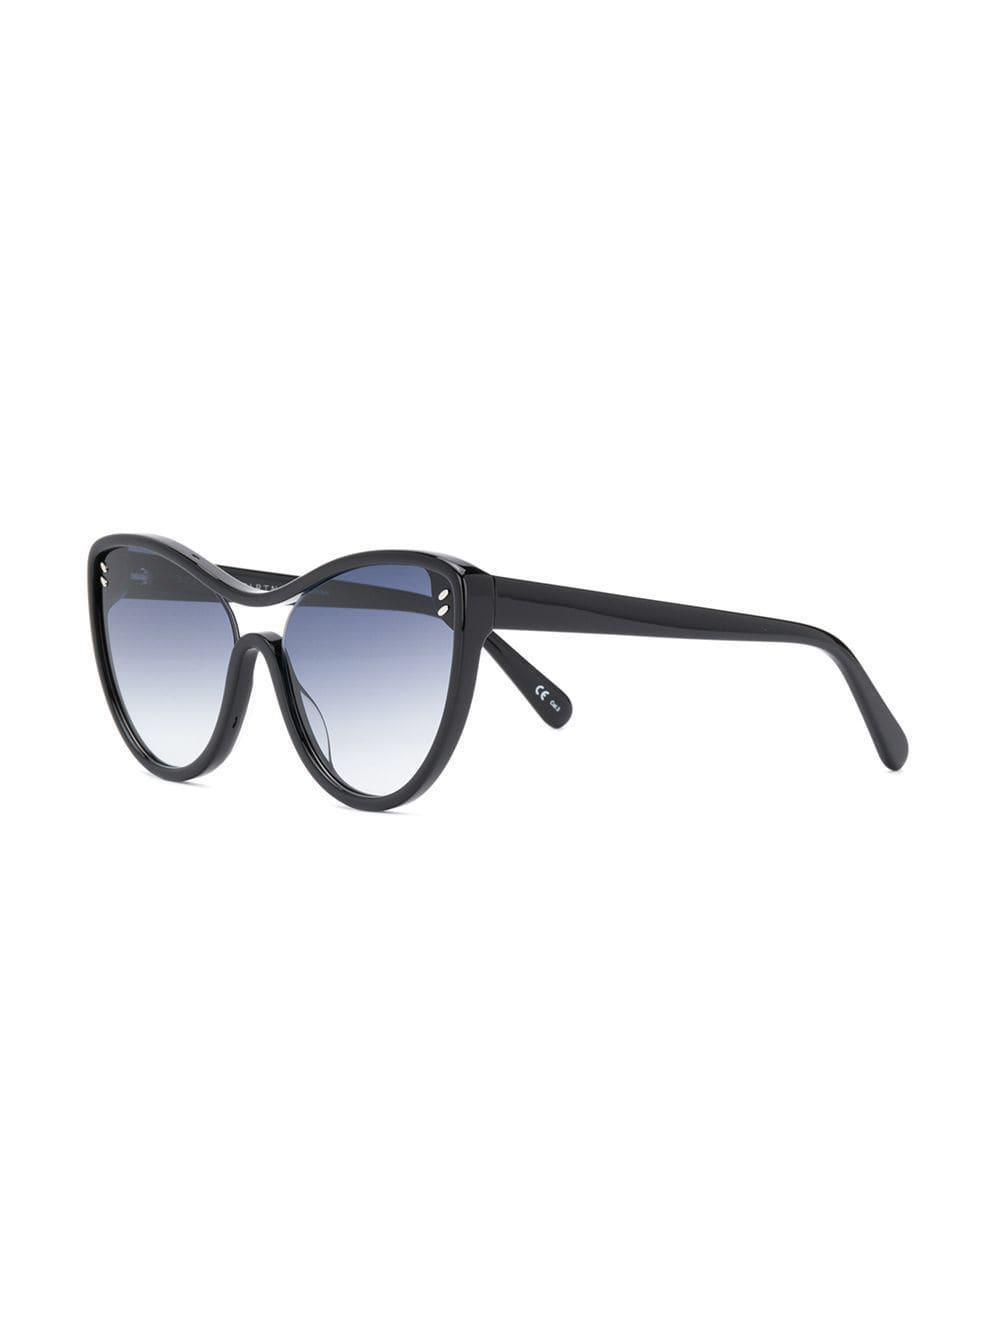 384fdc5f06 Stella McCartney - Black Cat-eye Frame Sunglasses - Lyst. View fullscreen